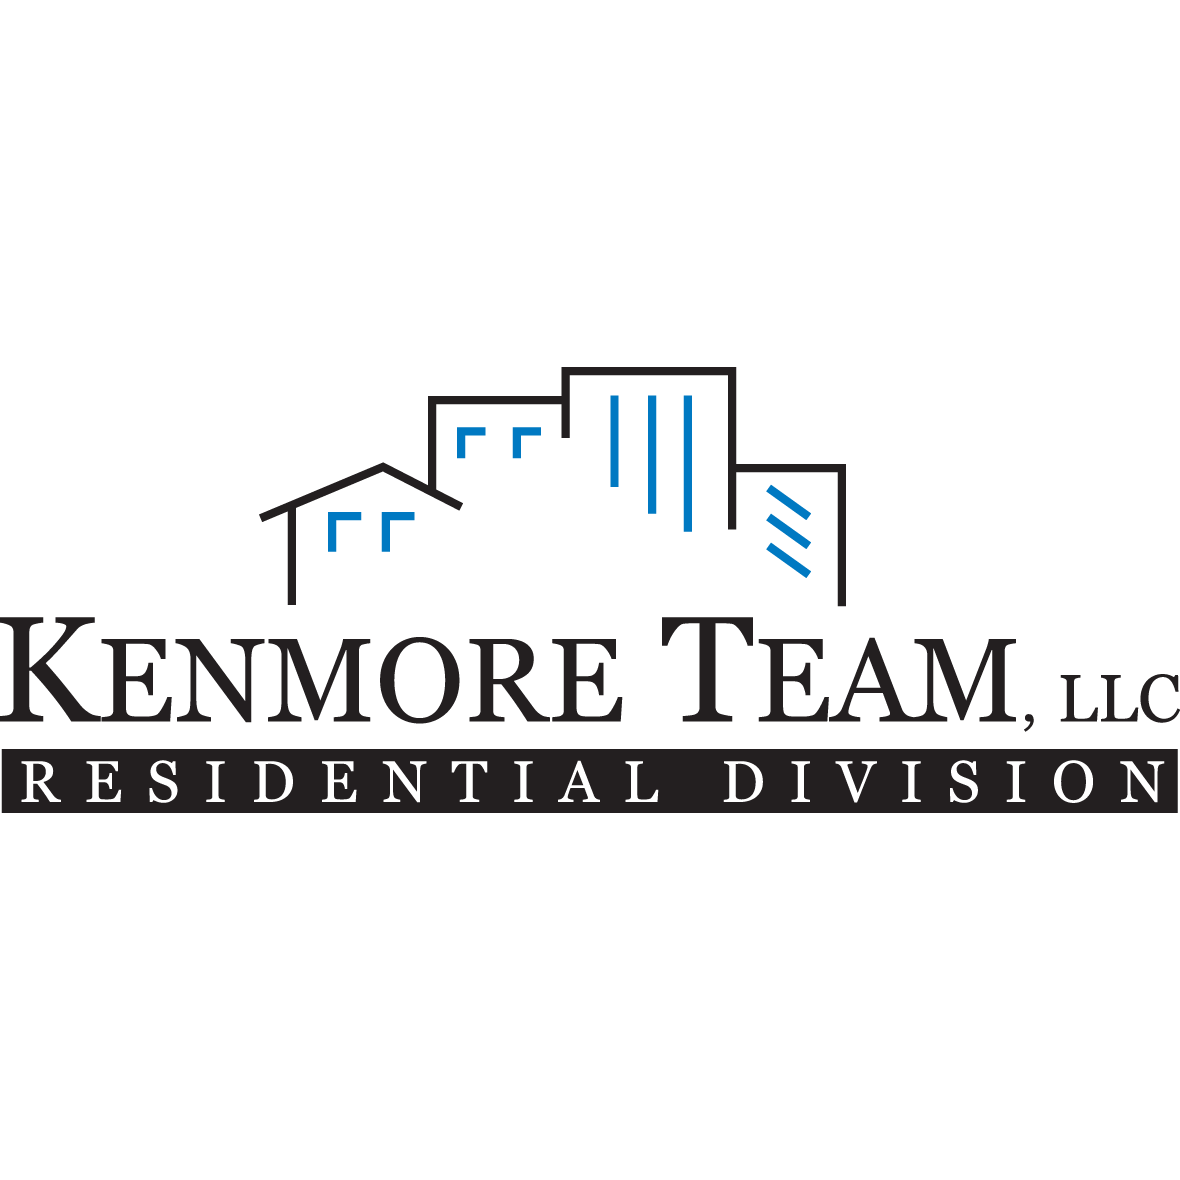 Kenmore Team LLC image 1